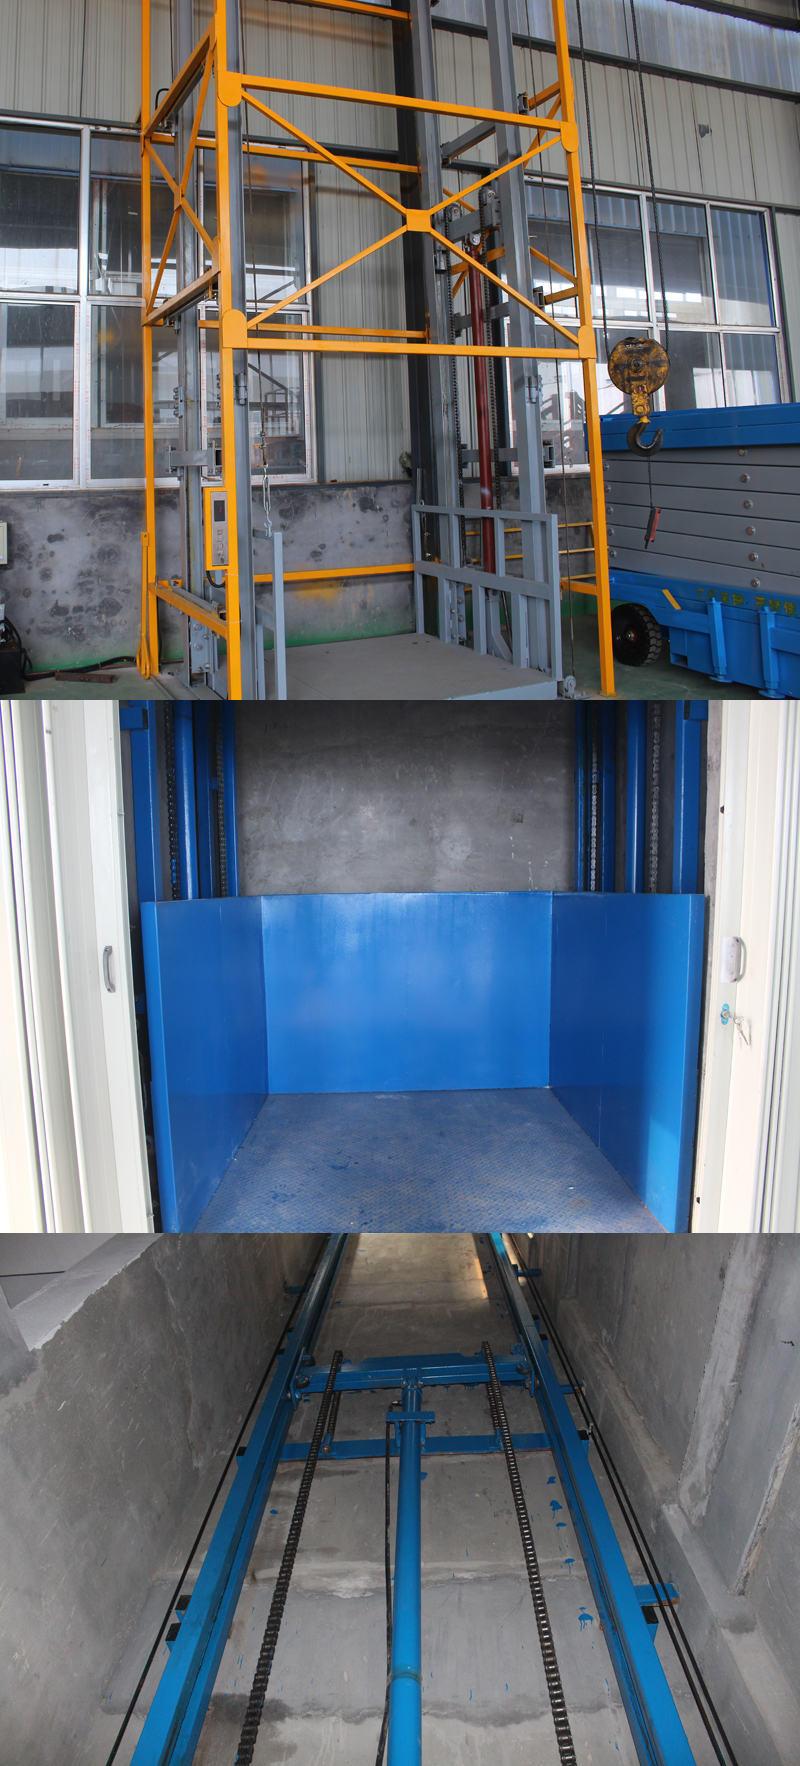 Hydraulic Vertical Lift : Vertical guide rail elevators hydraulic warehouse cargo